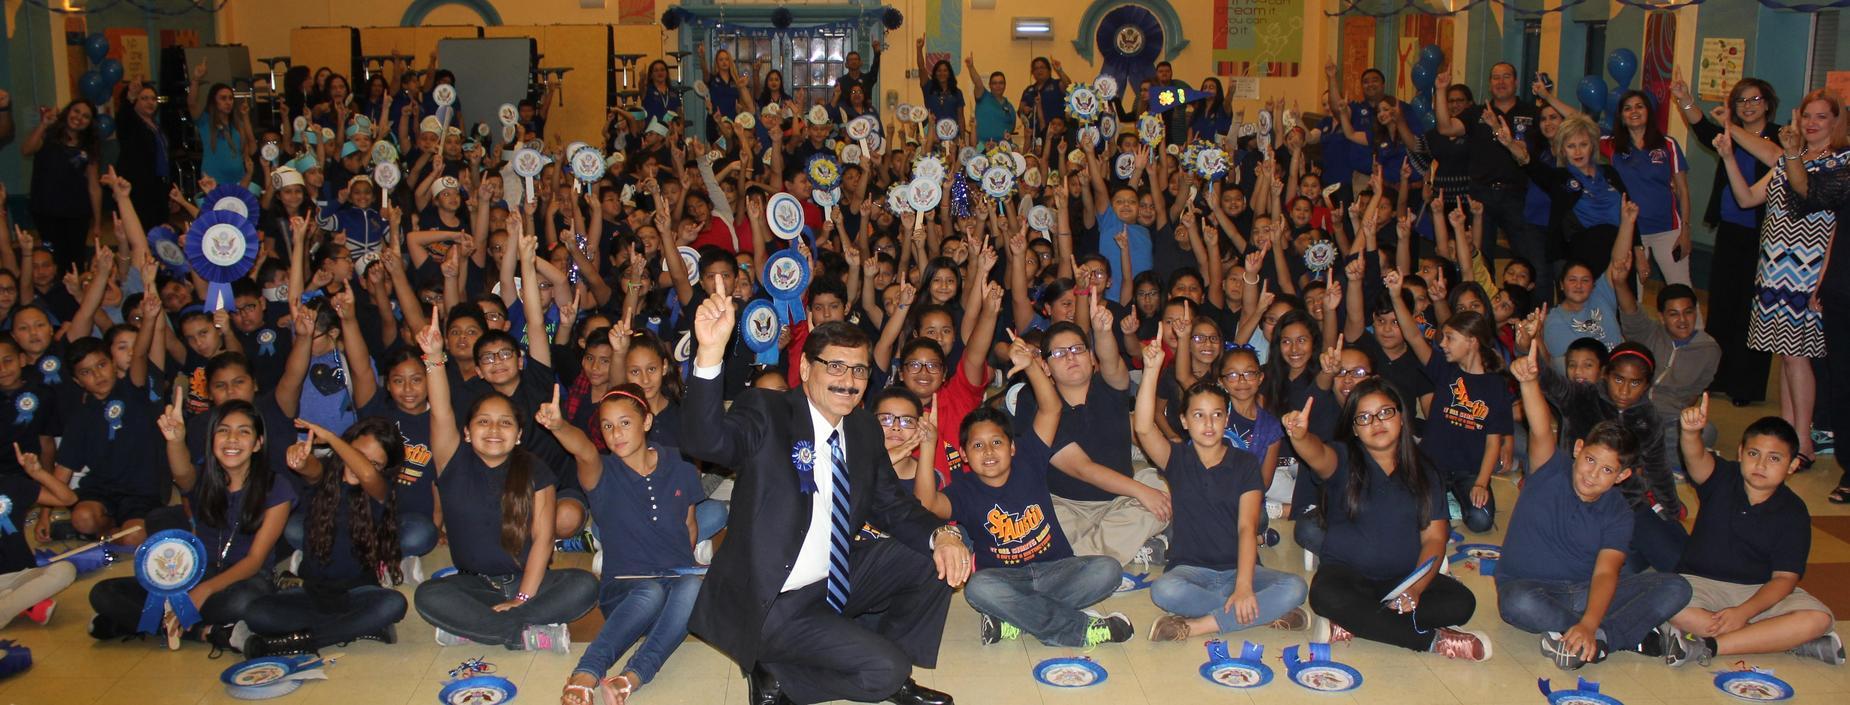 Mr. Cano -National Blue Ribbon School